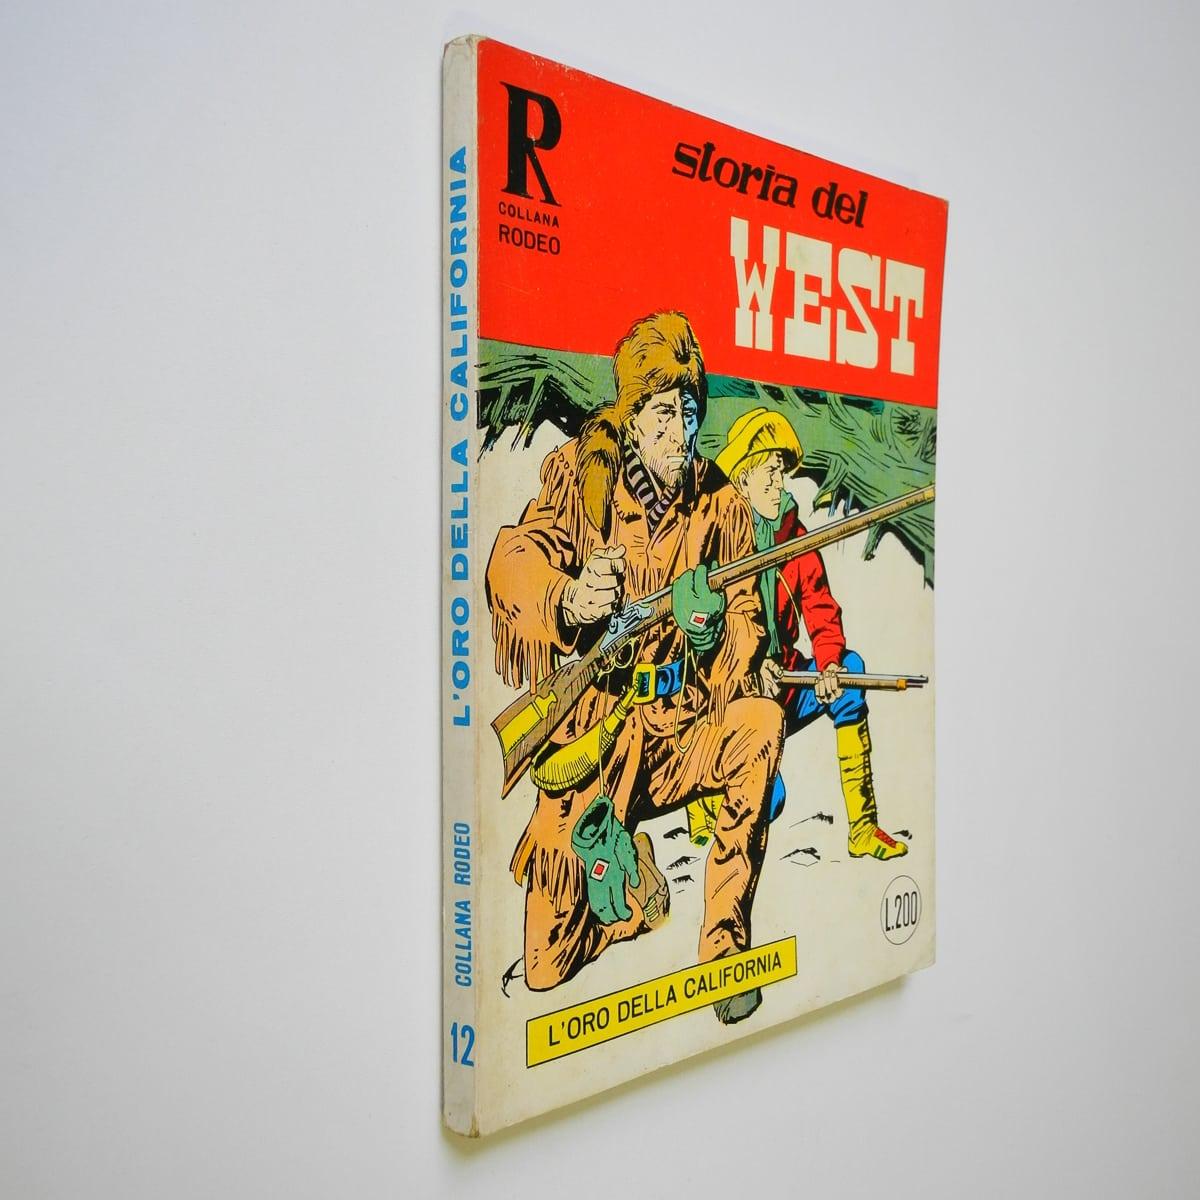 Collana Rodeo n. 12 Storia del West (2) Araldo